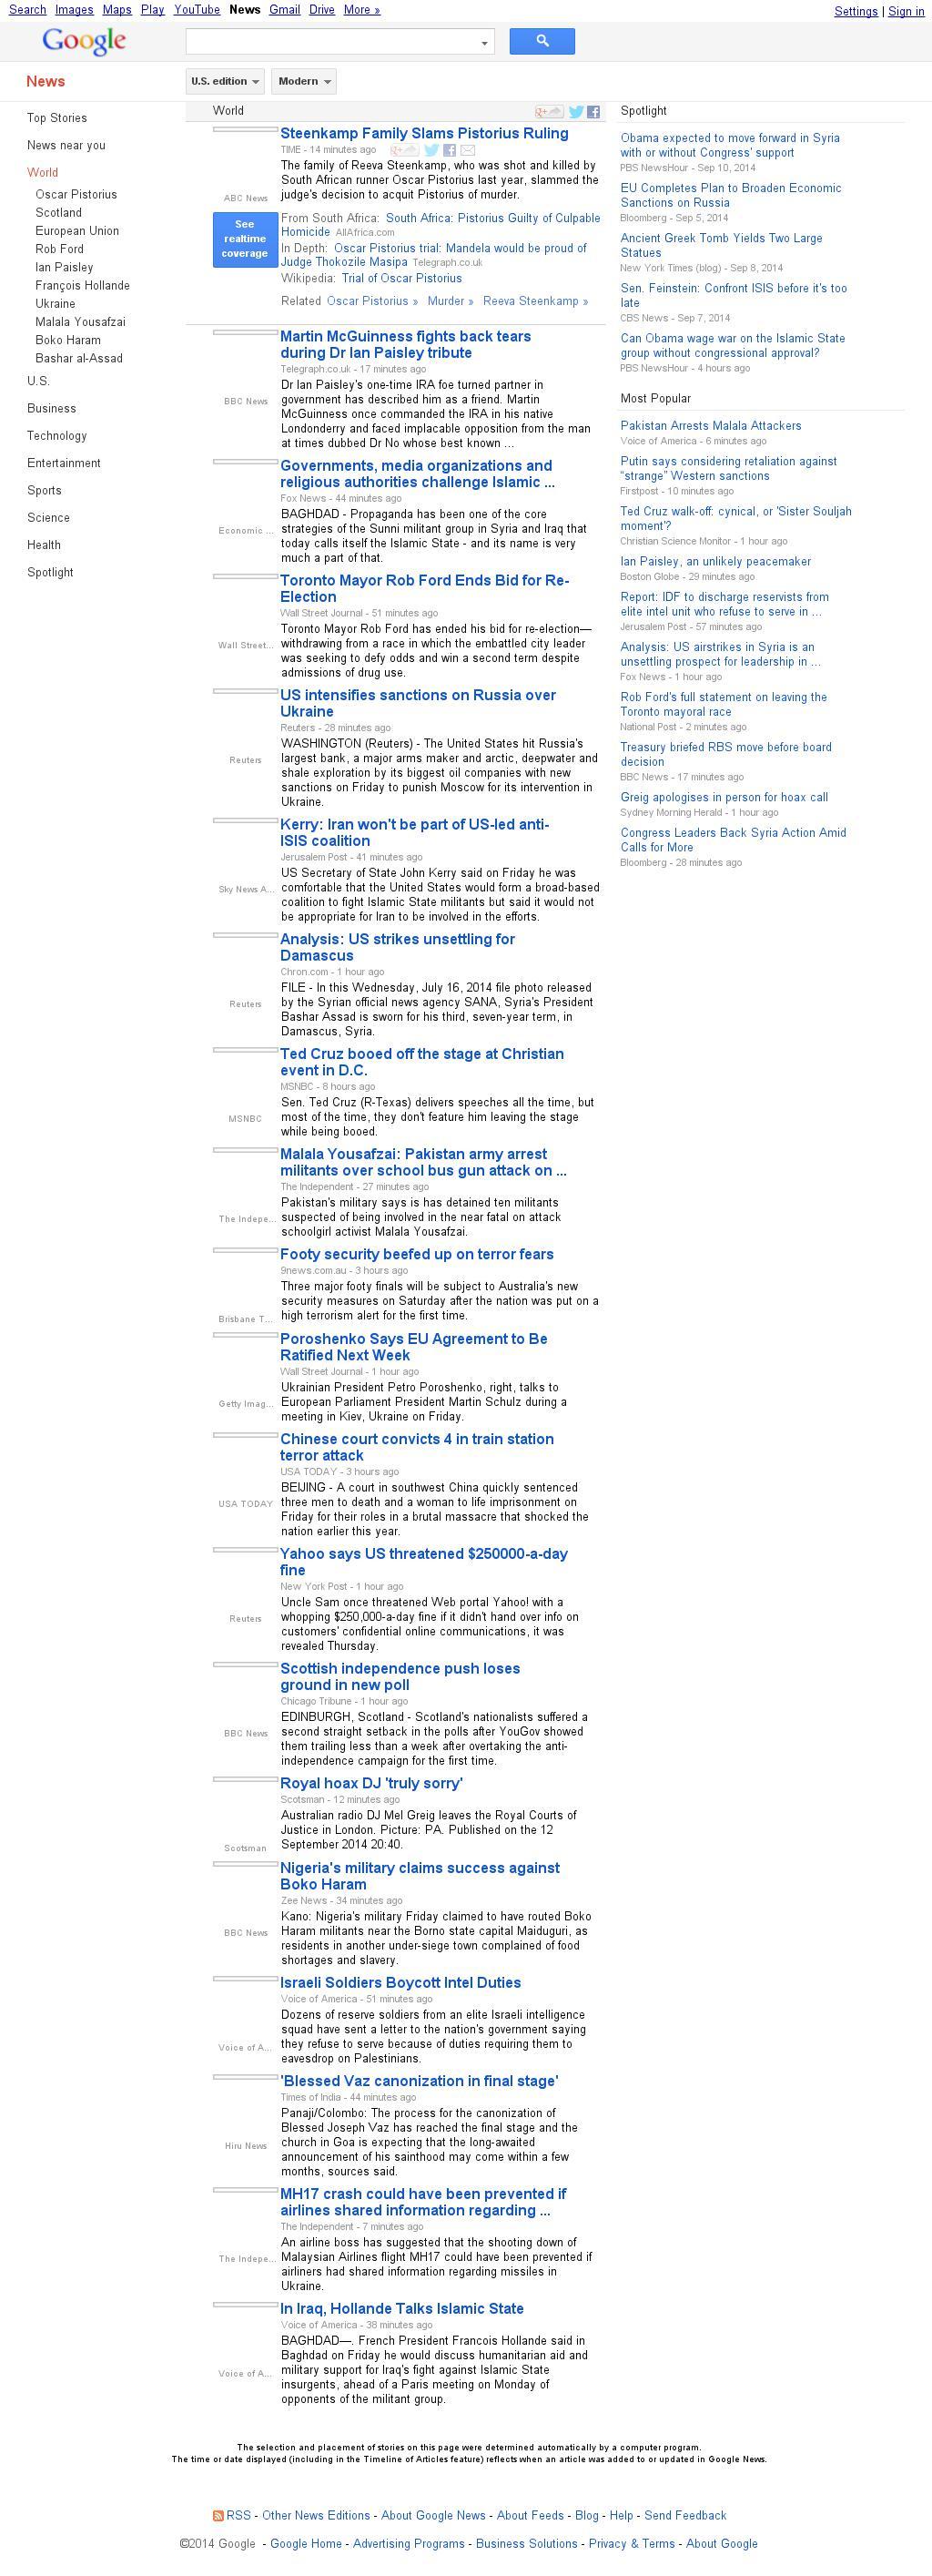 Google News: World at Friday Sept. 12, 2014, 8:08 p.m. UTC